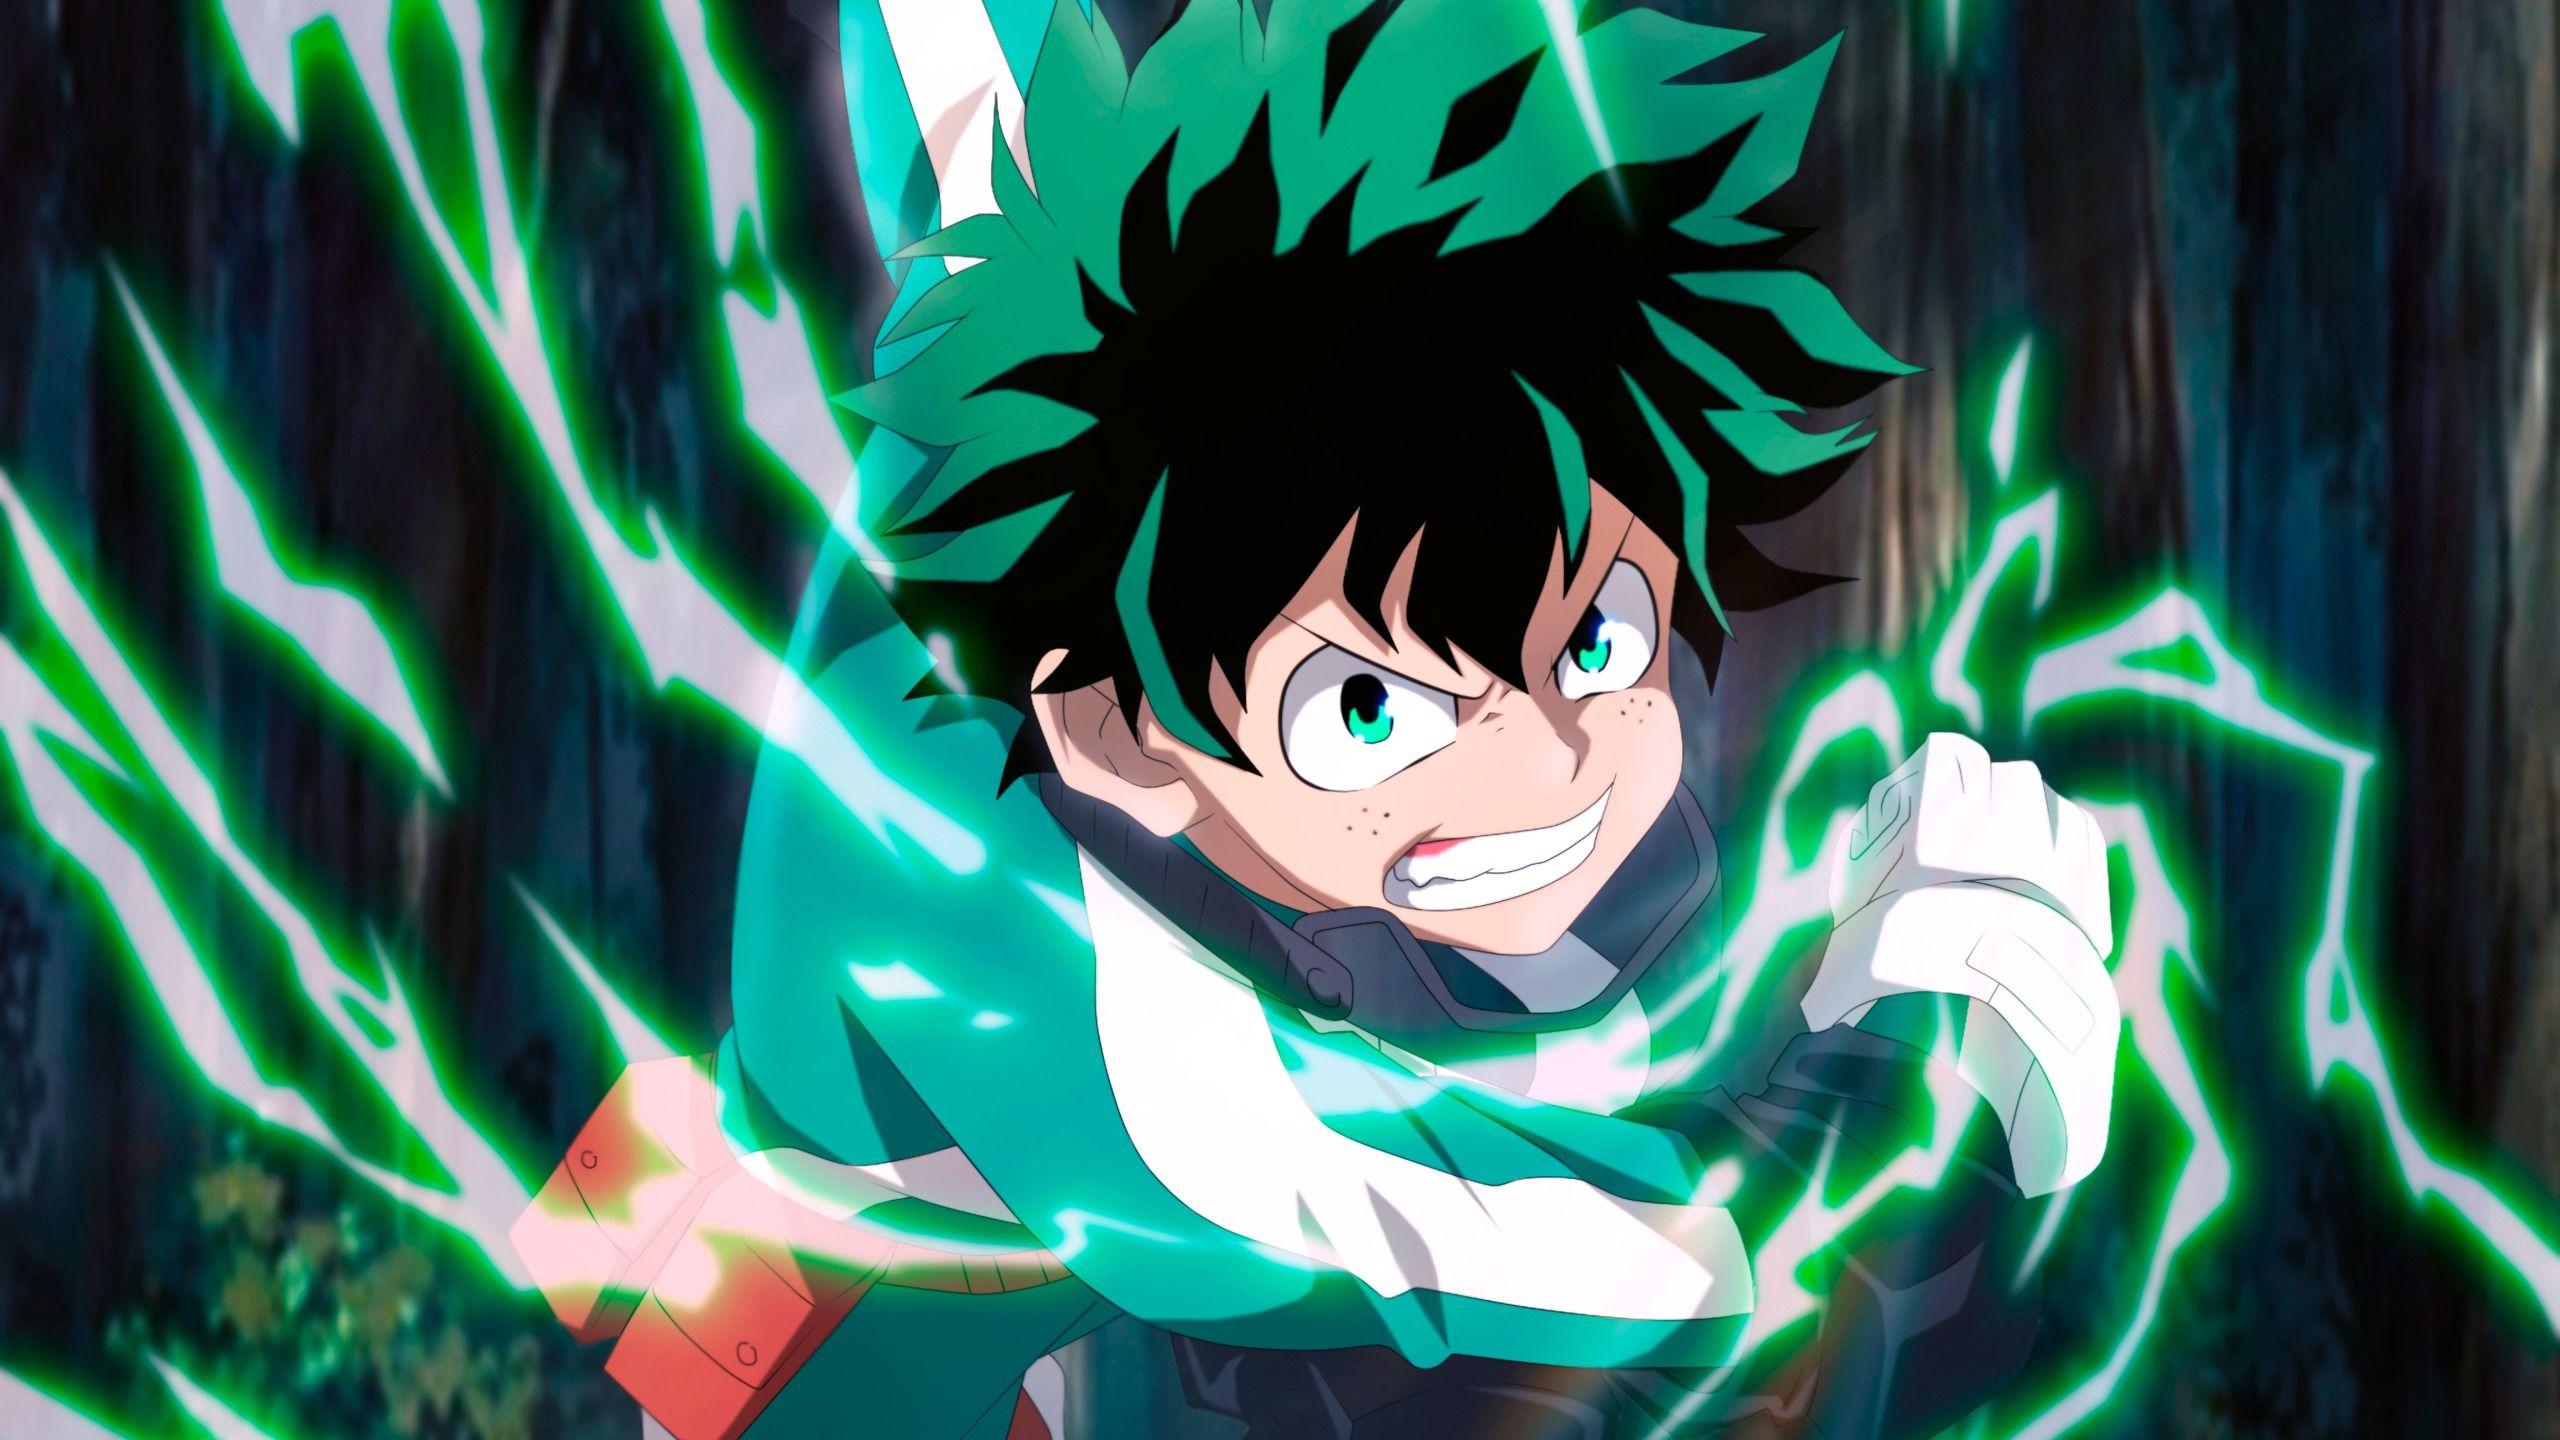 Boku No Hero Academia Hd Wallpapers New Tab Install Boku No Hero Academia New Tab And Get Hd Wallpapers Of Deku Made For Fans Who Love Anime Manga